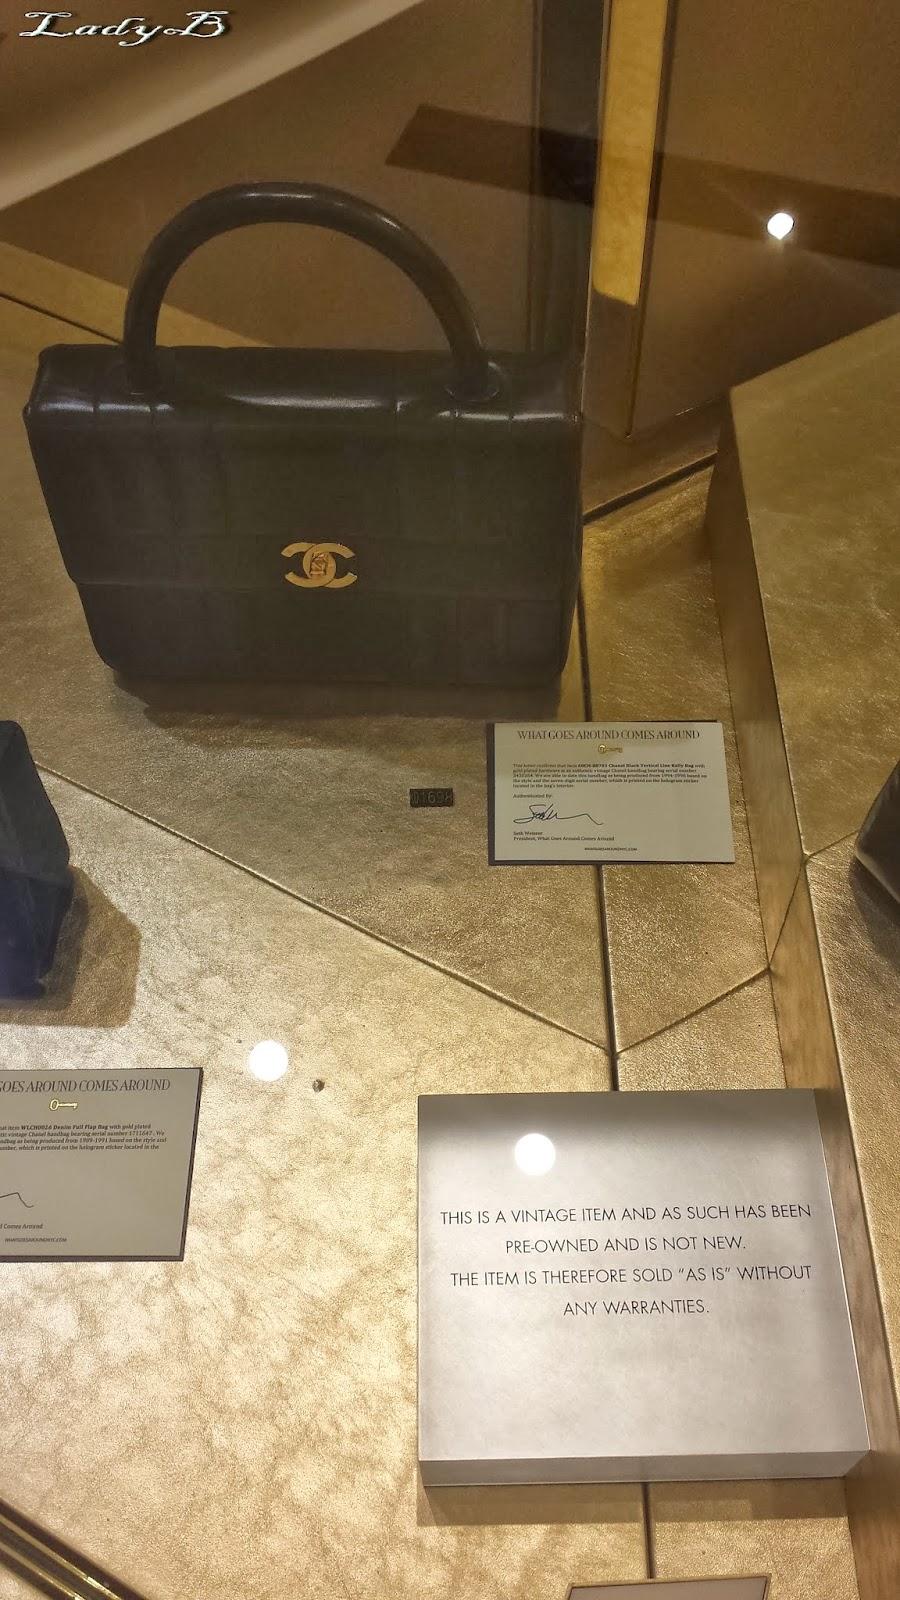 Vintage Chanel At Harvey Nichols Kuwait